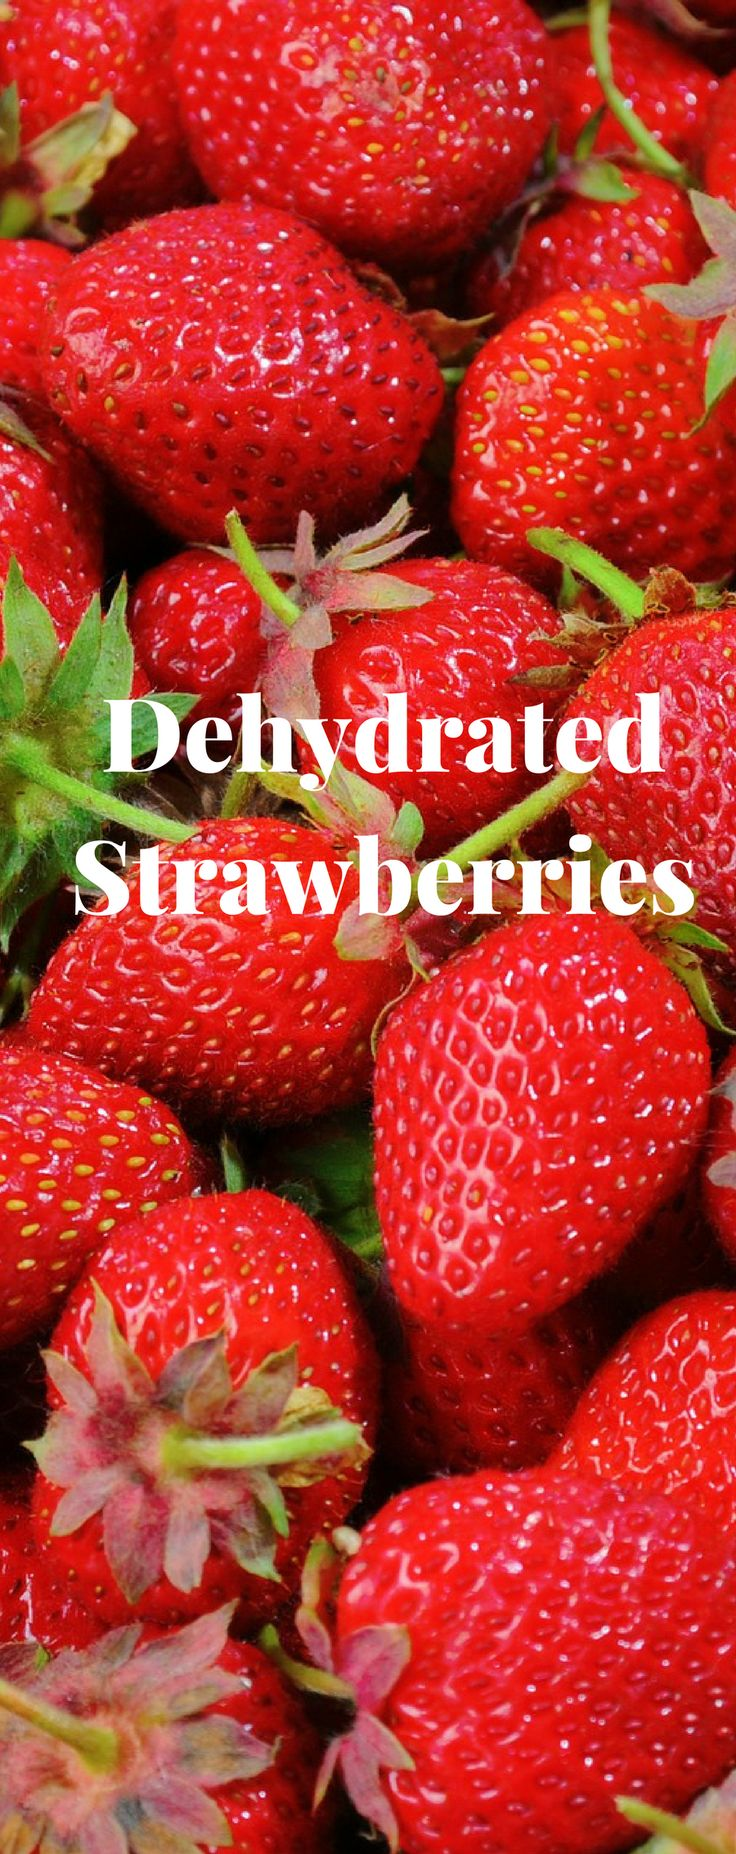 722b5472ab31bc37e20071b44e7ede1d dehydrated strawberries life hacks